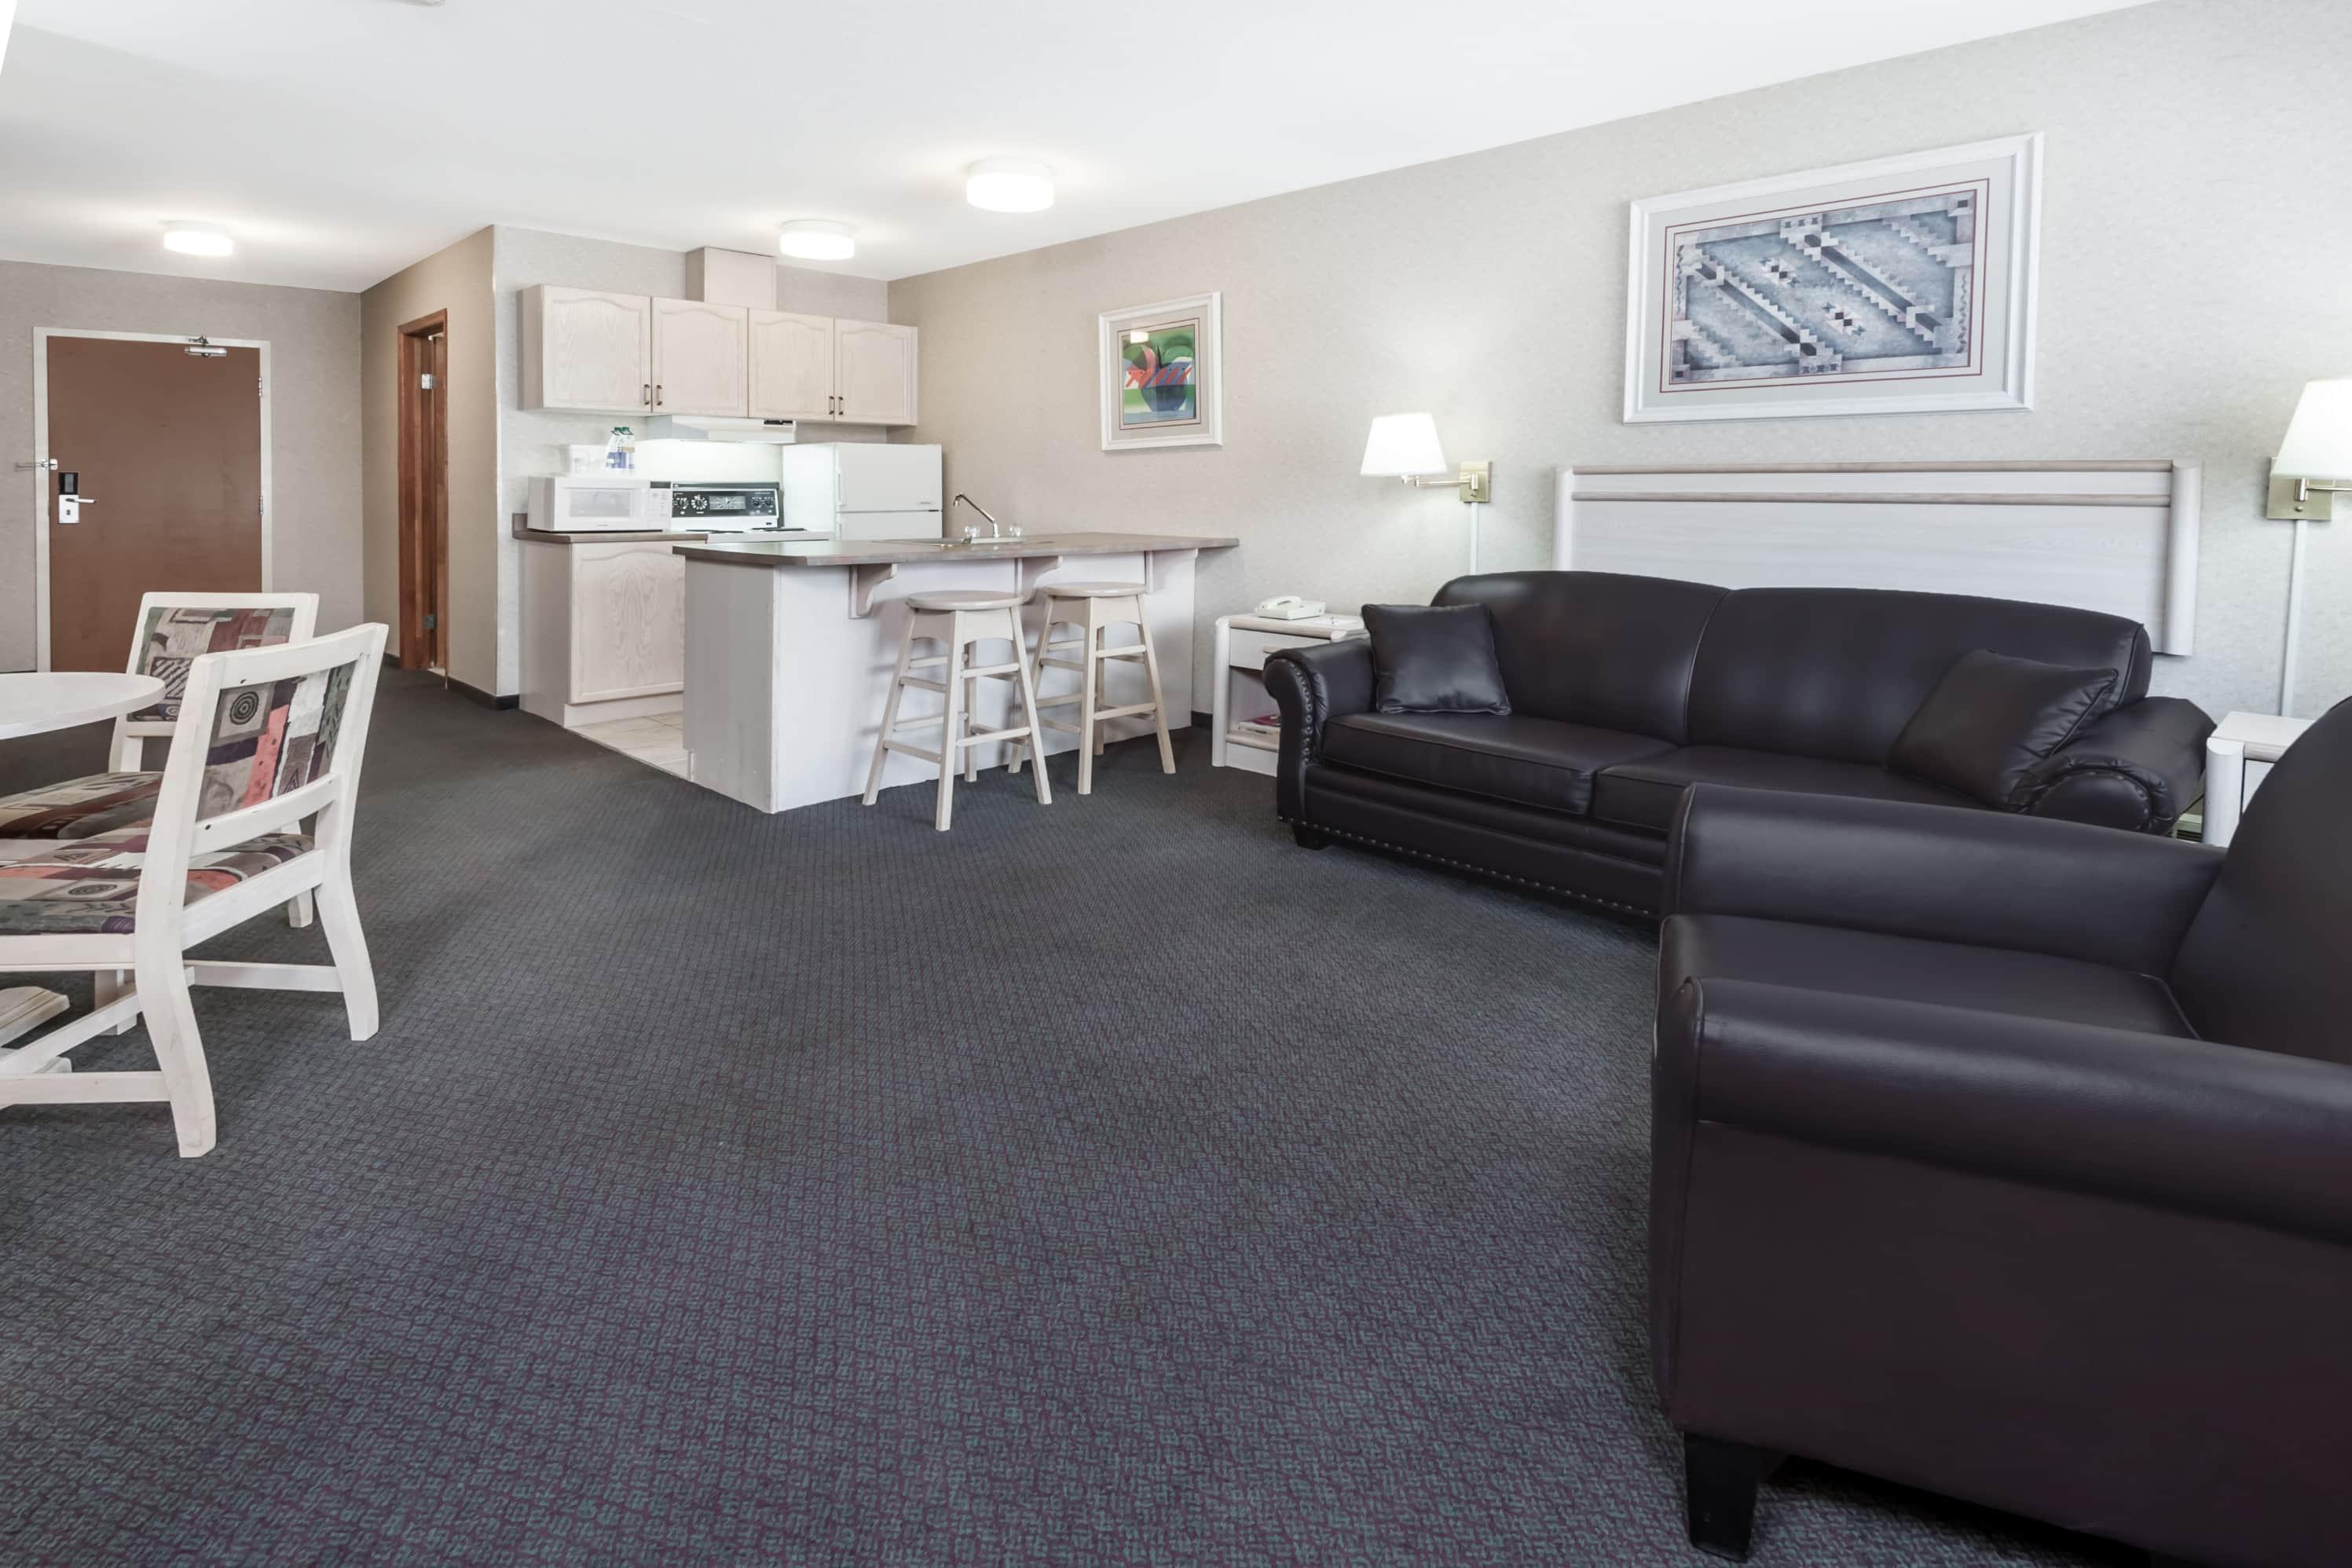 Ramada Stony Plain Hotel & Suites suite in Stony Plain, Alberta